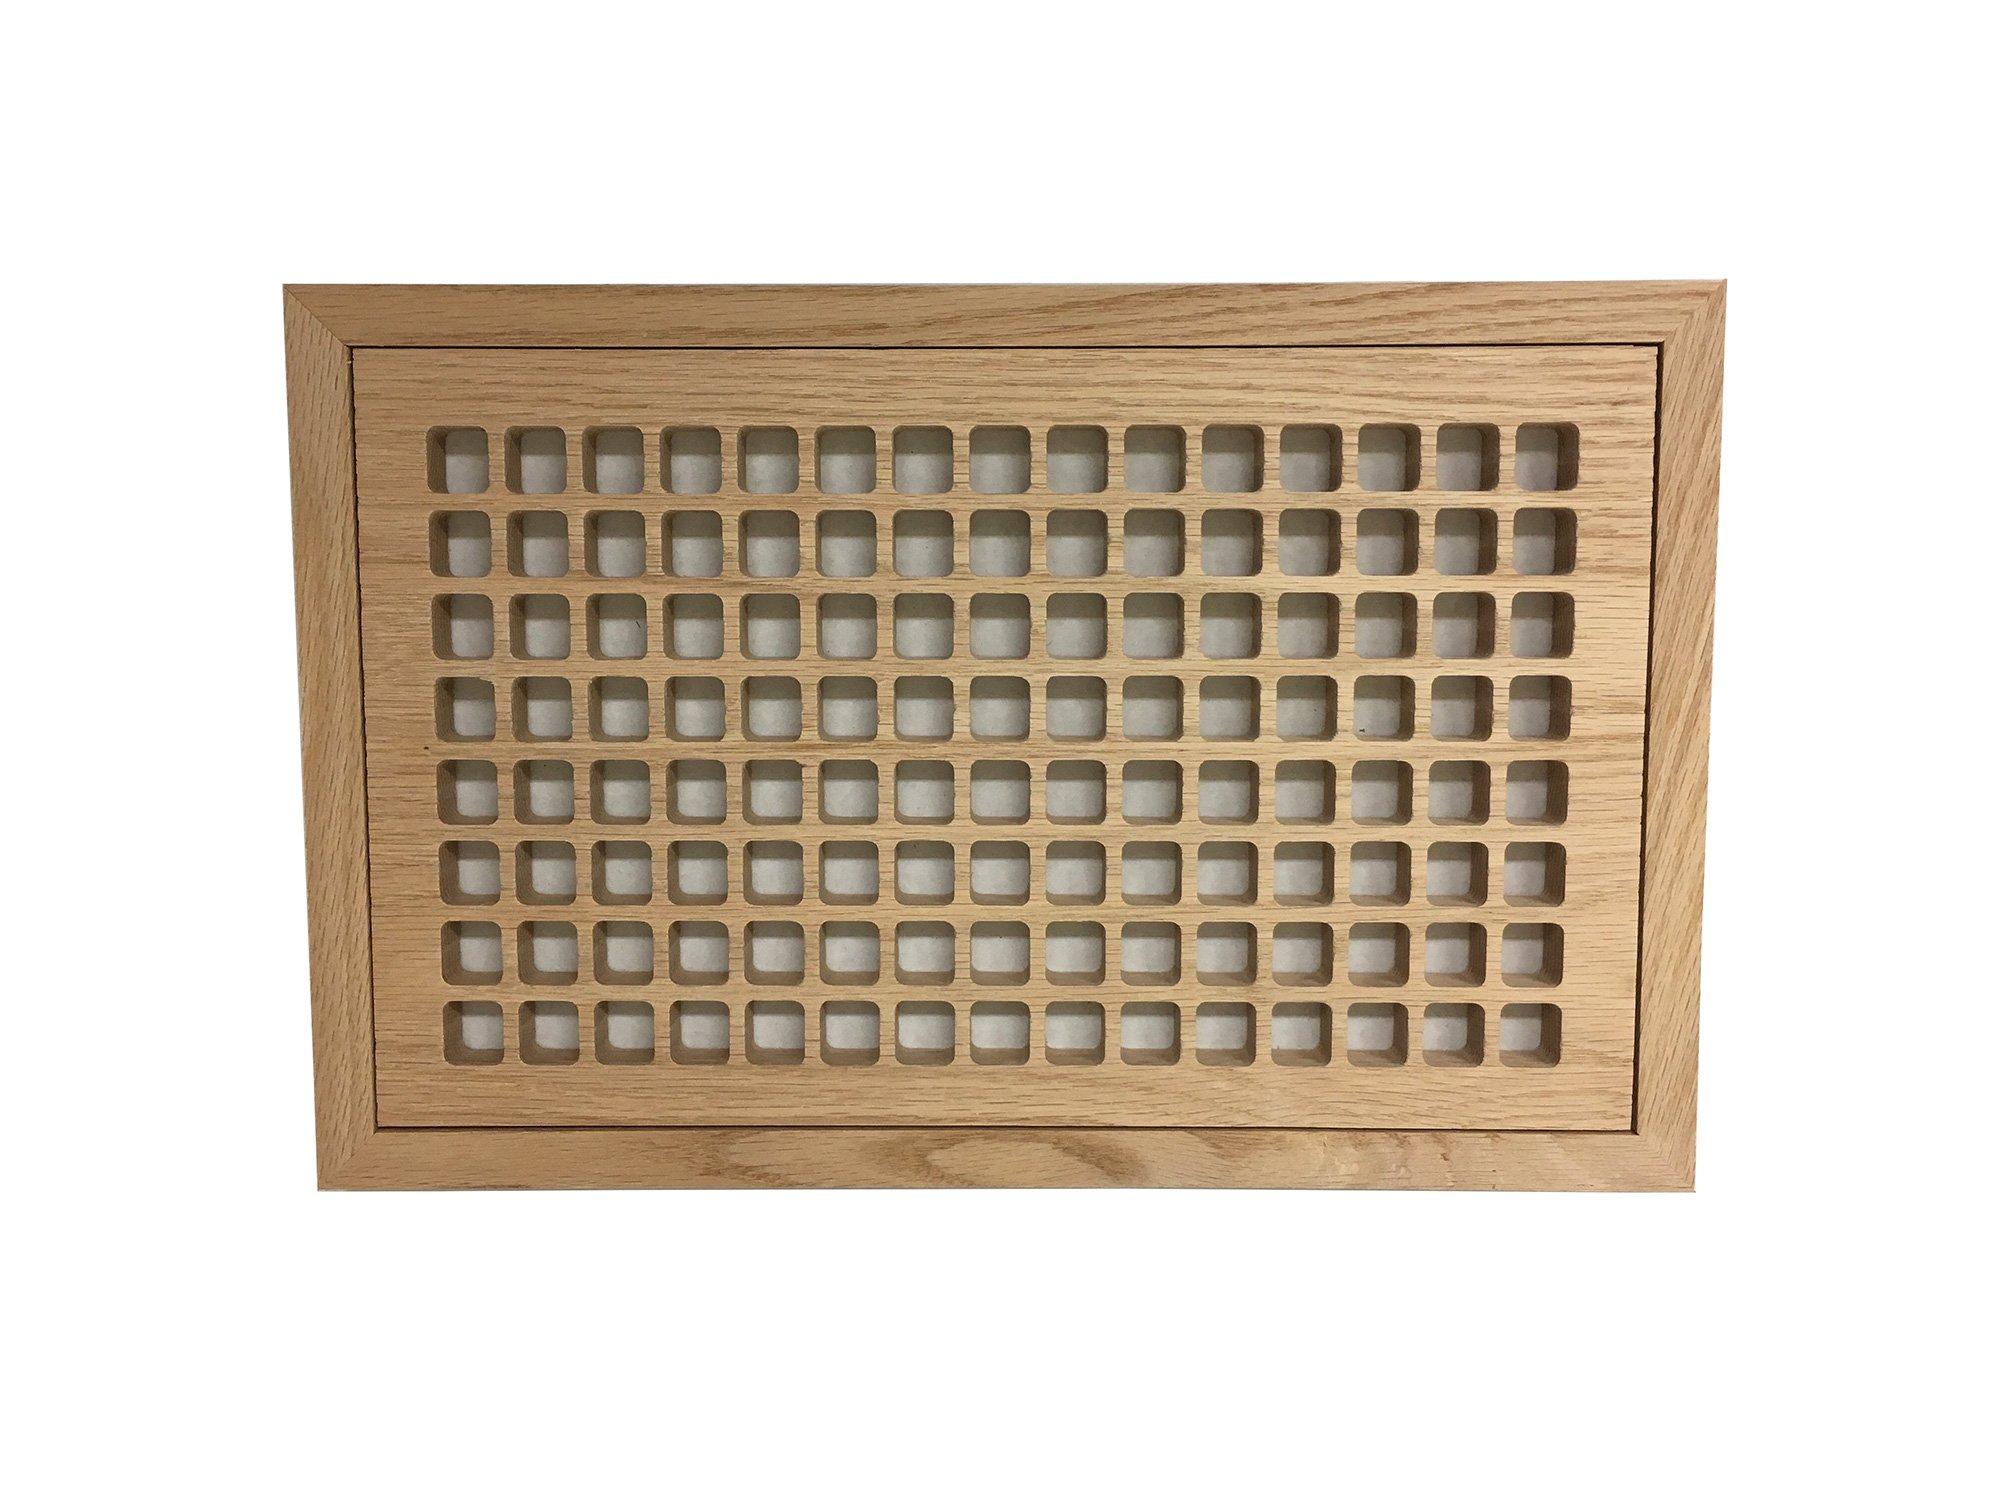 8 Inch x 14 Inch Red Oak Hardwood Vent Floor Register Flush Mount with Frame, Eggcrate Style, Unfinished